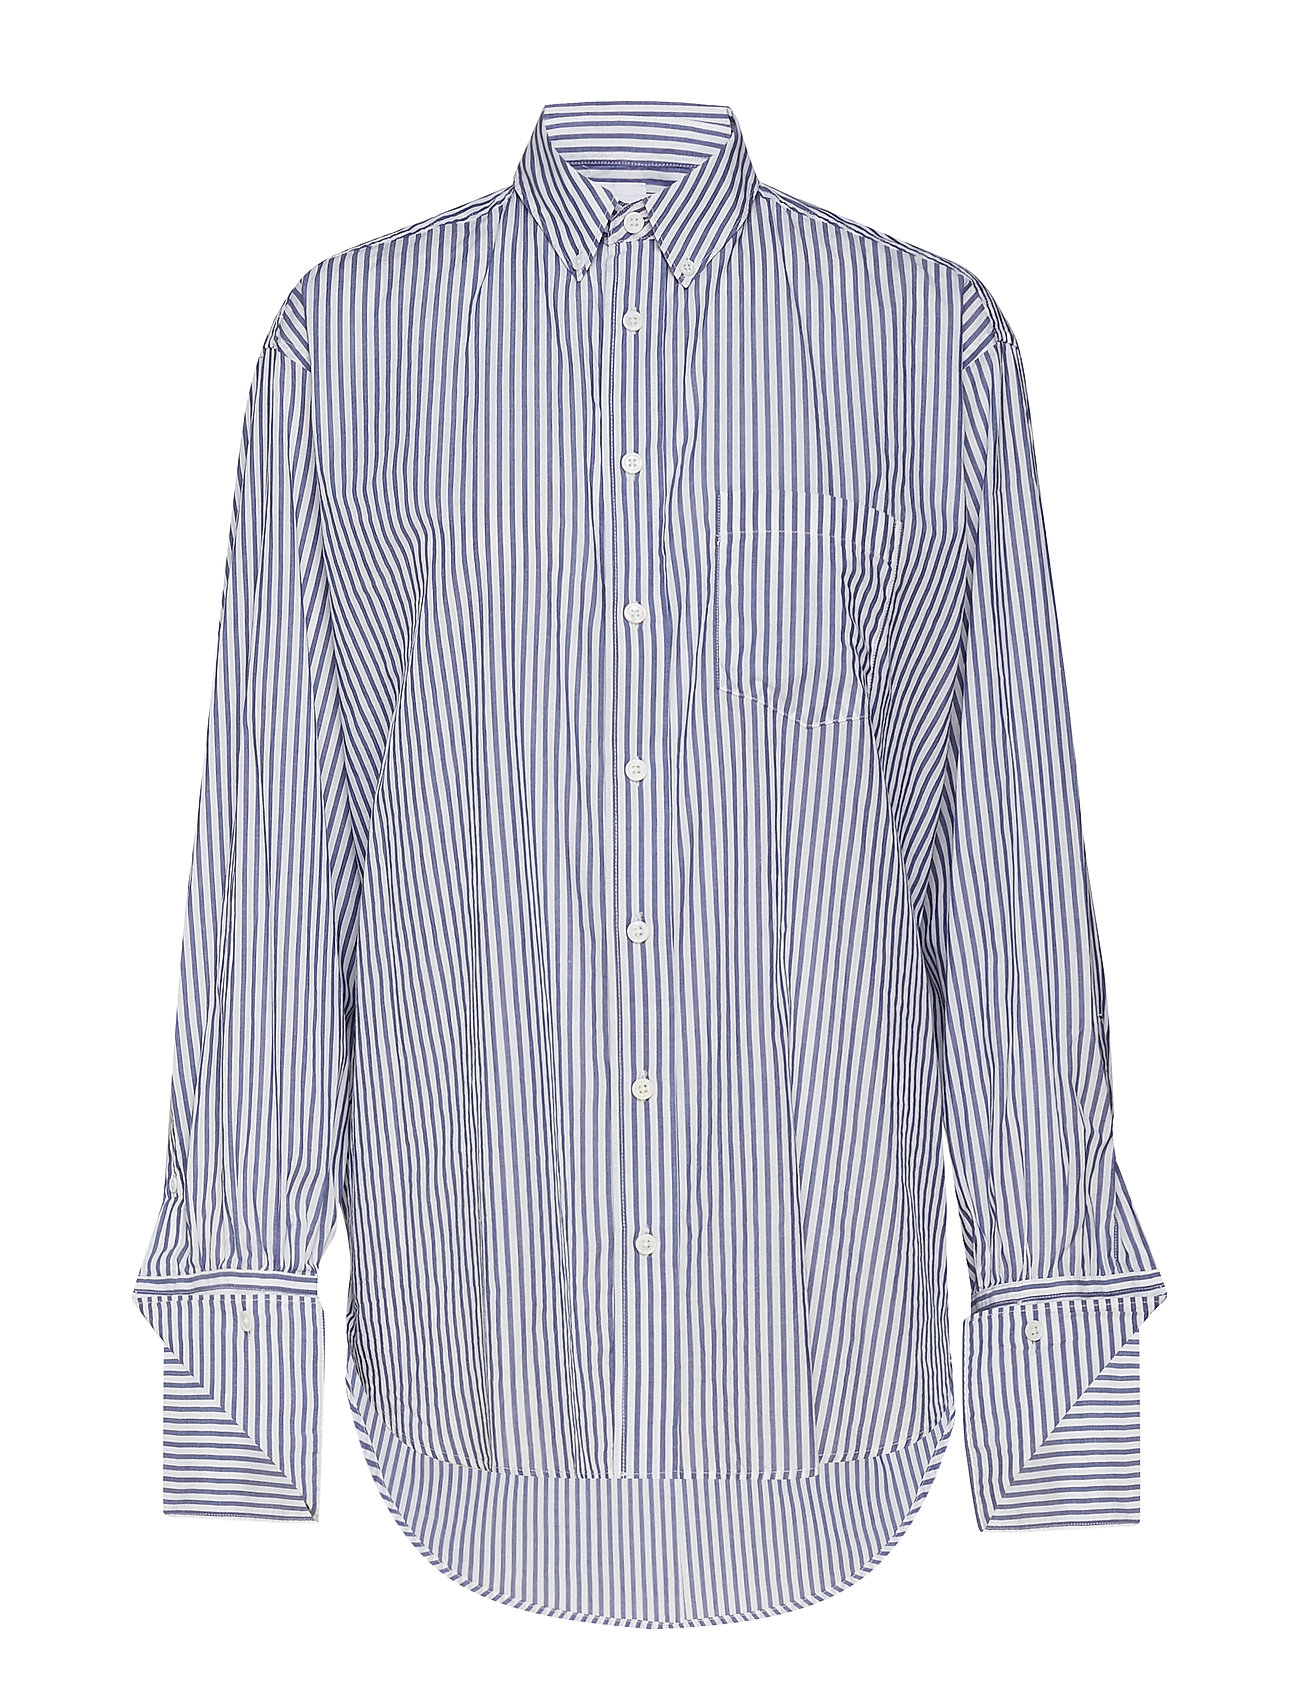 Image of Brave Shirt Langærmet Skjorte Blå HOPE (3189851409)